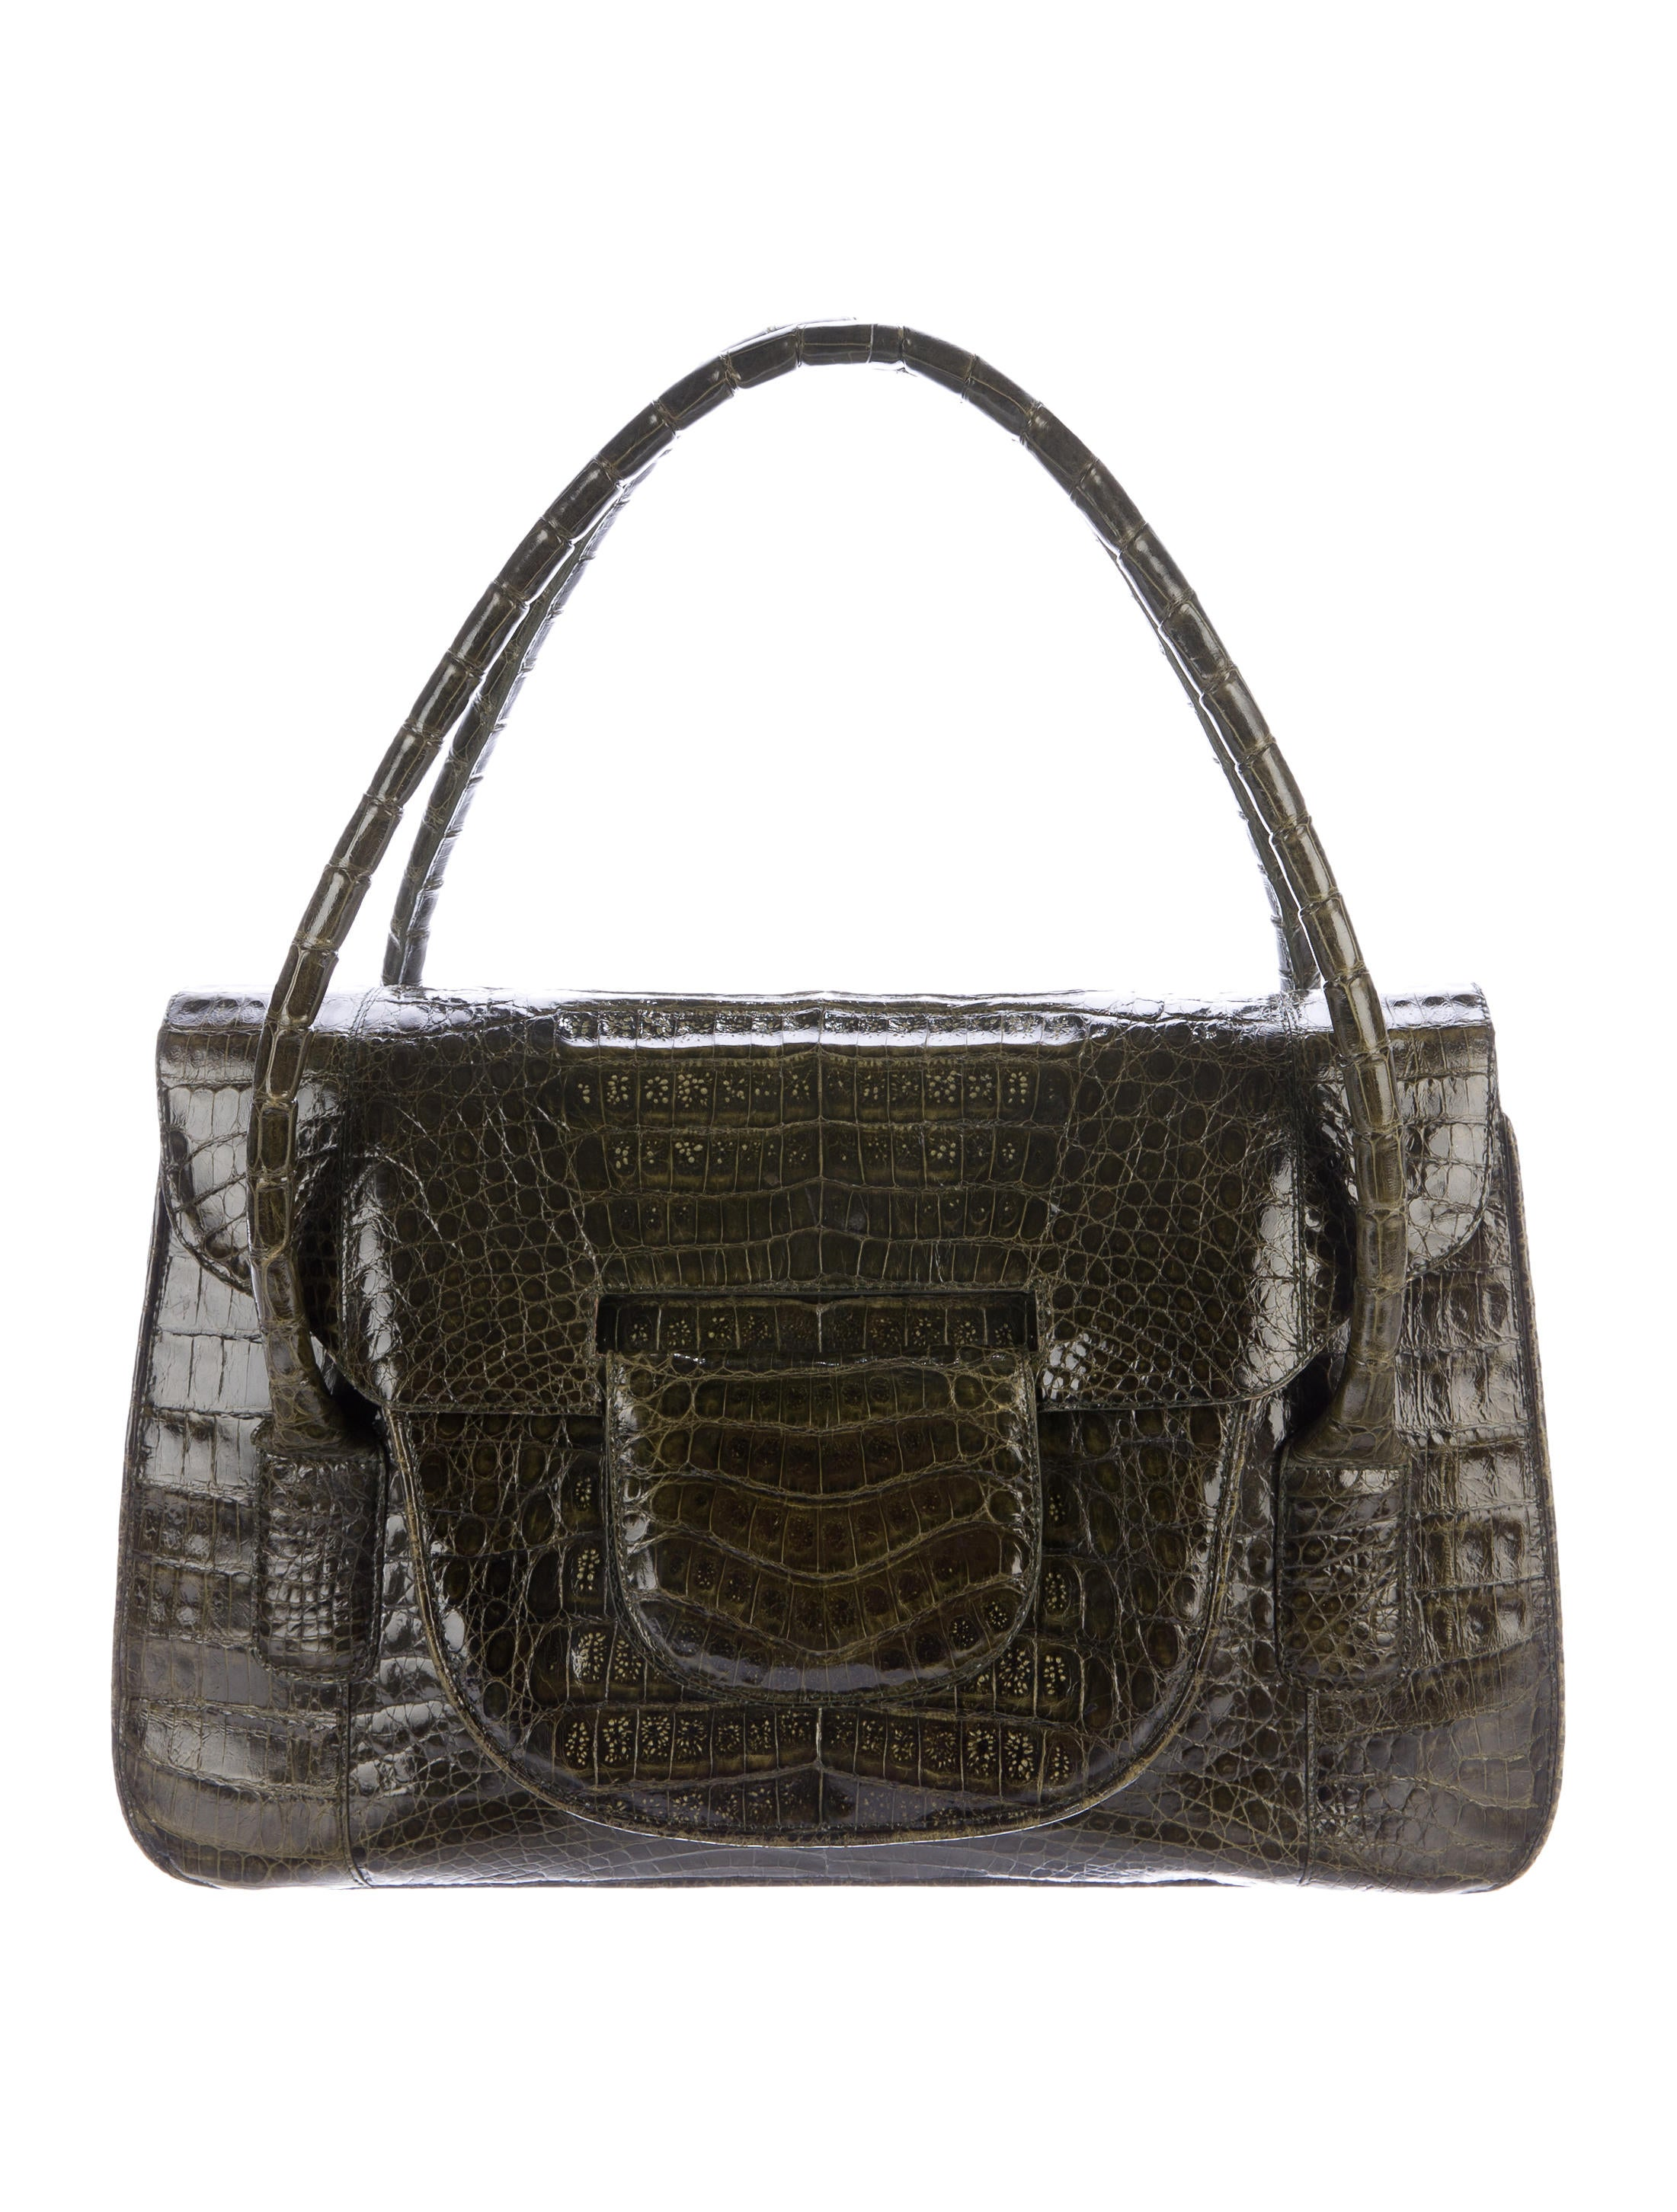 Nancy Gonzalez Crocodile Shoulder Bag Handbags